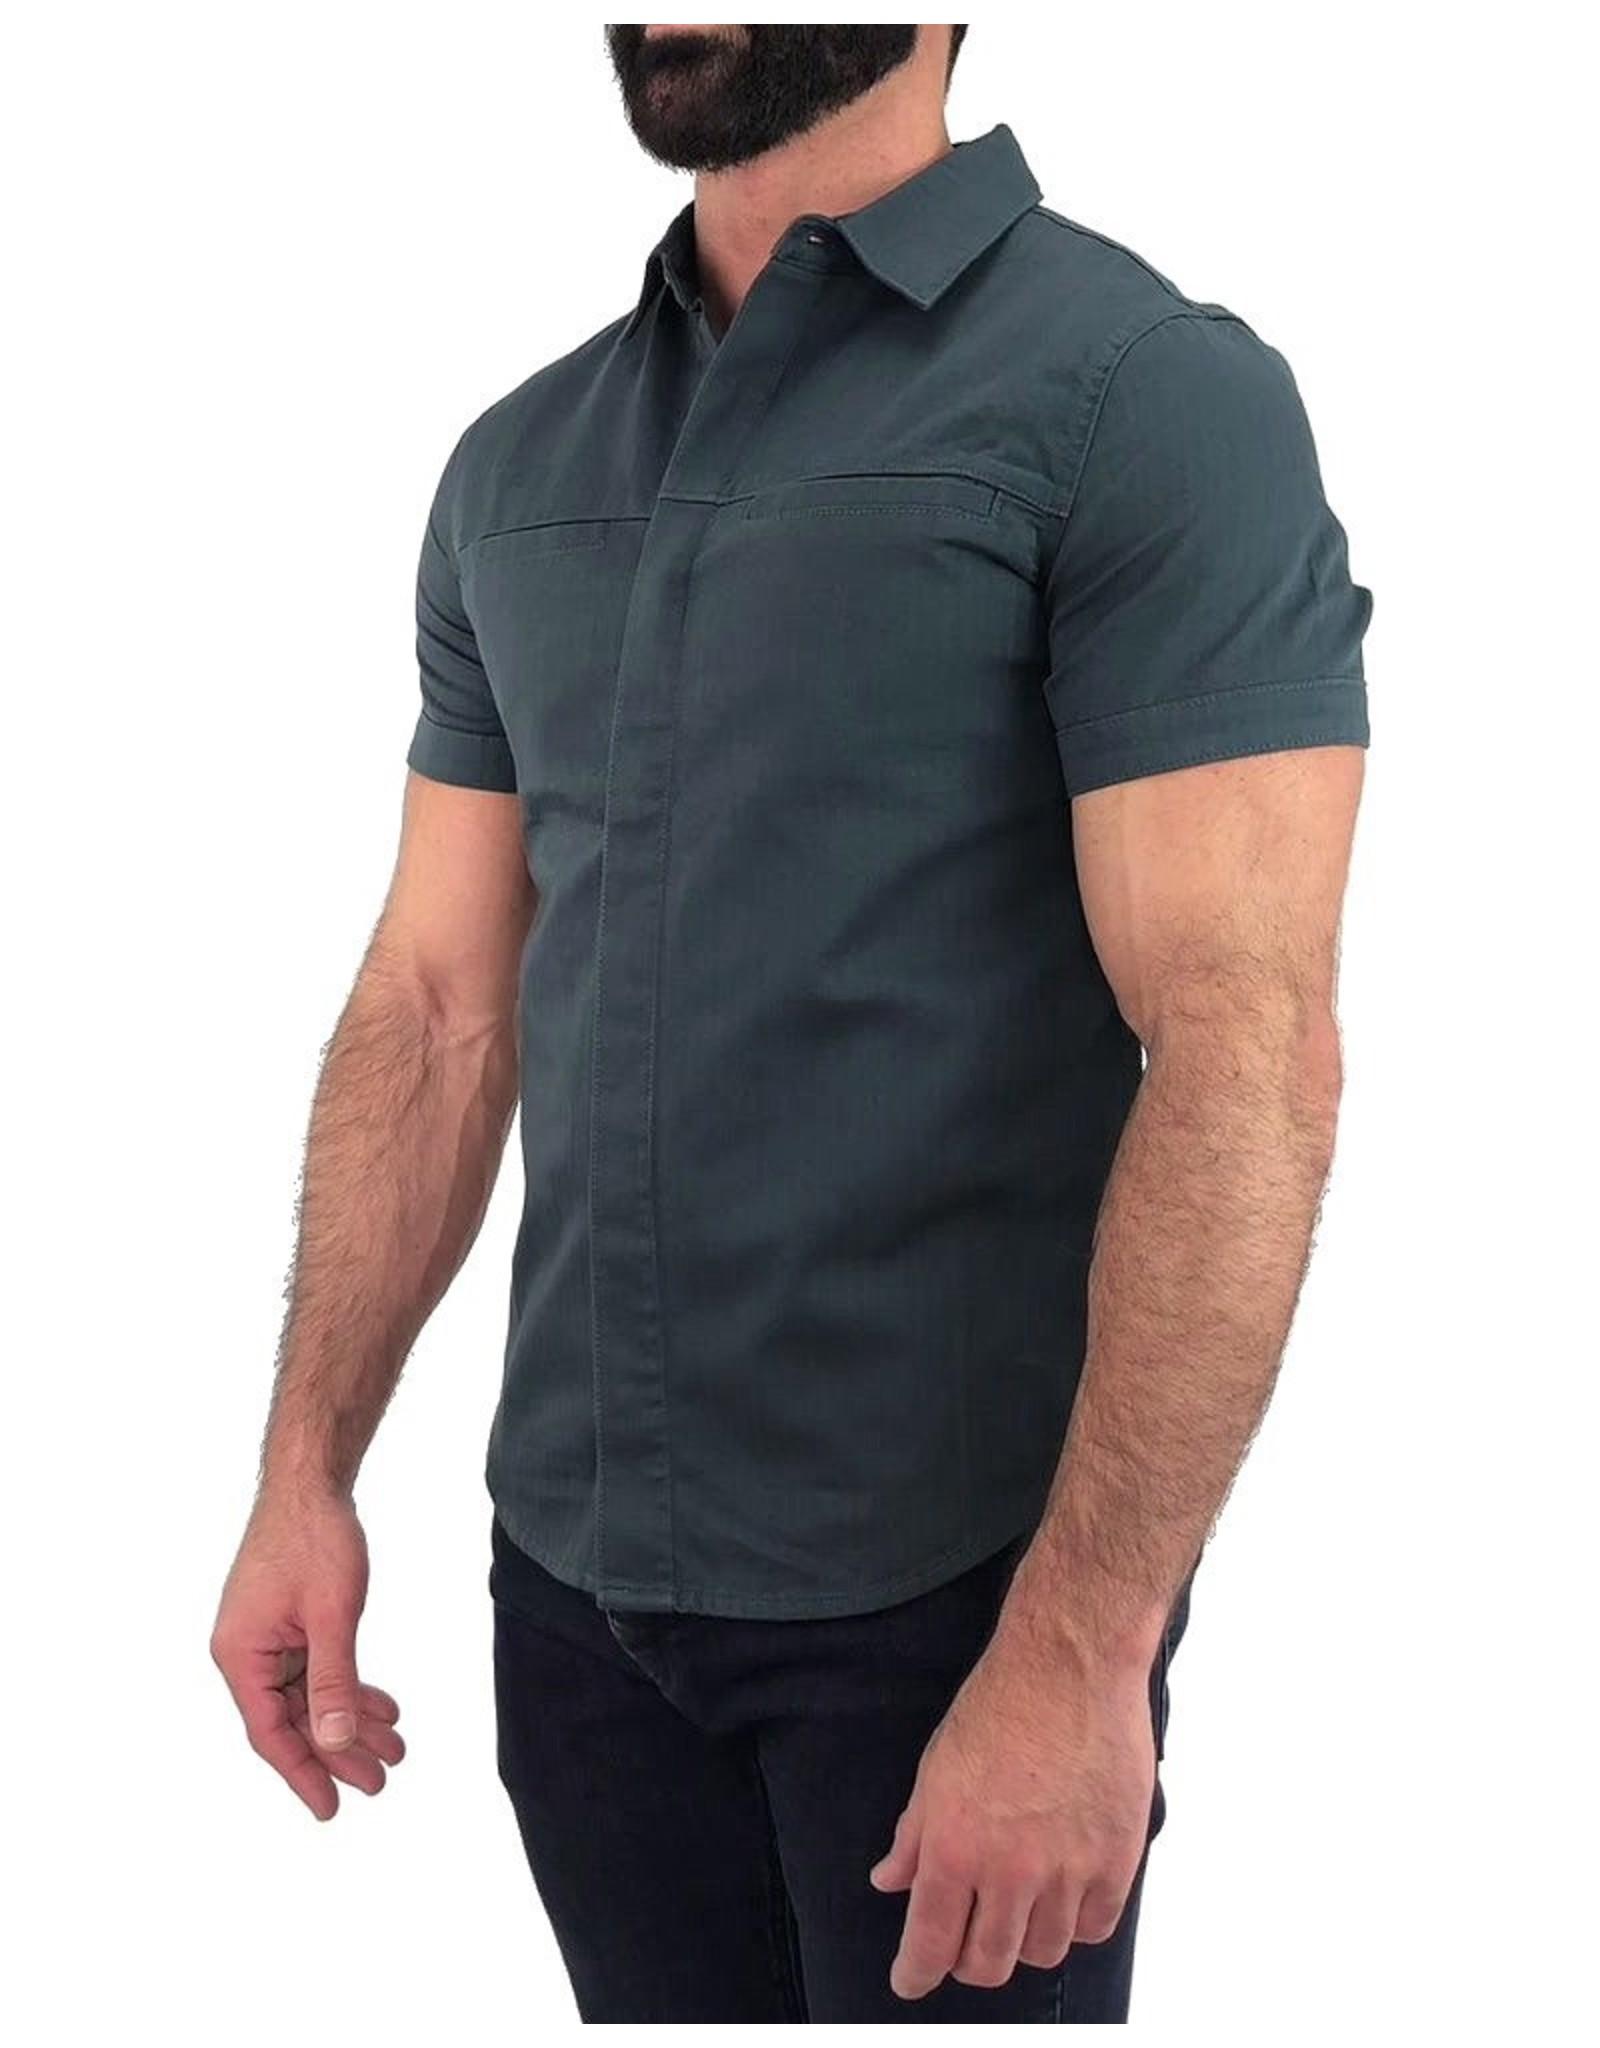 Nasty Pig Nasty Pig Renegade Short Sleeve Shirt